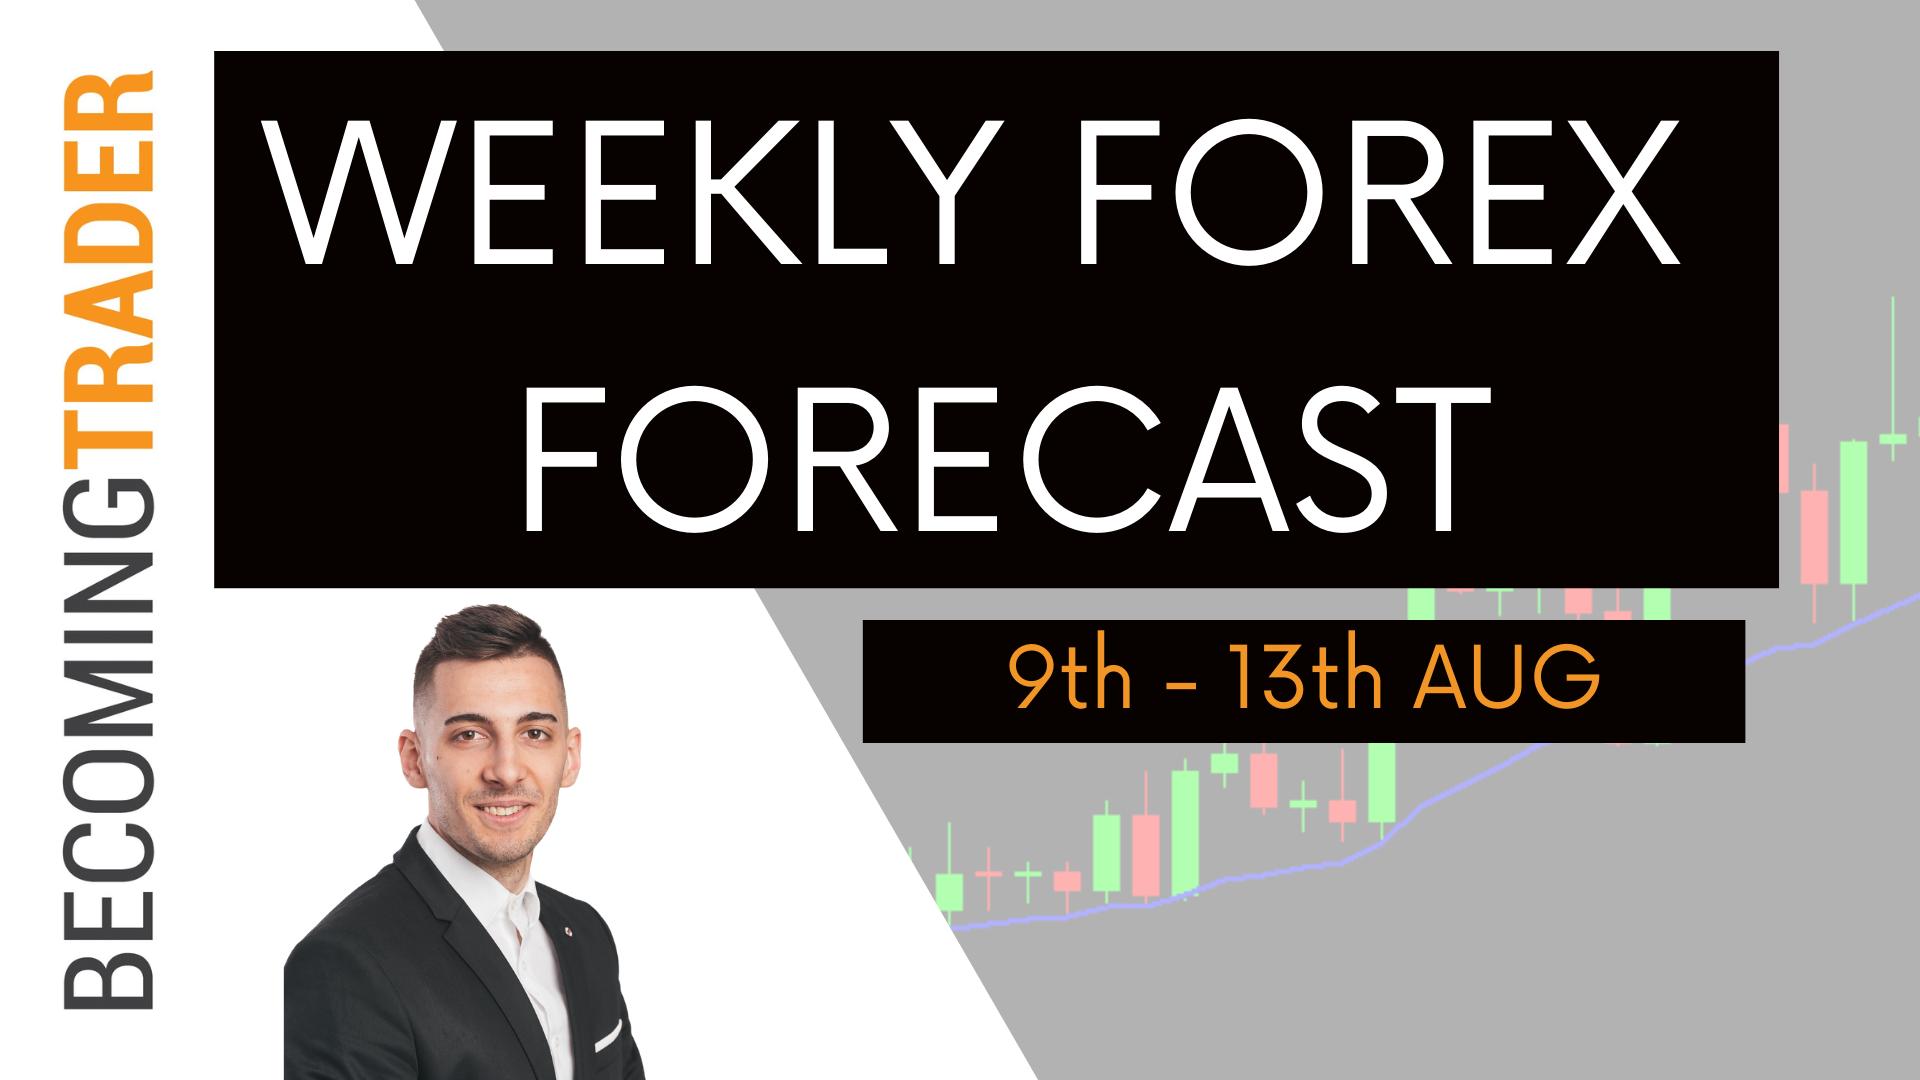 Weekly Forex Forecast 9th to 13th August 2021   EURUSD , GBPUSD , AUDUSD , NZDUSD , USDCAD , USDJPY